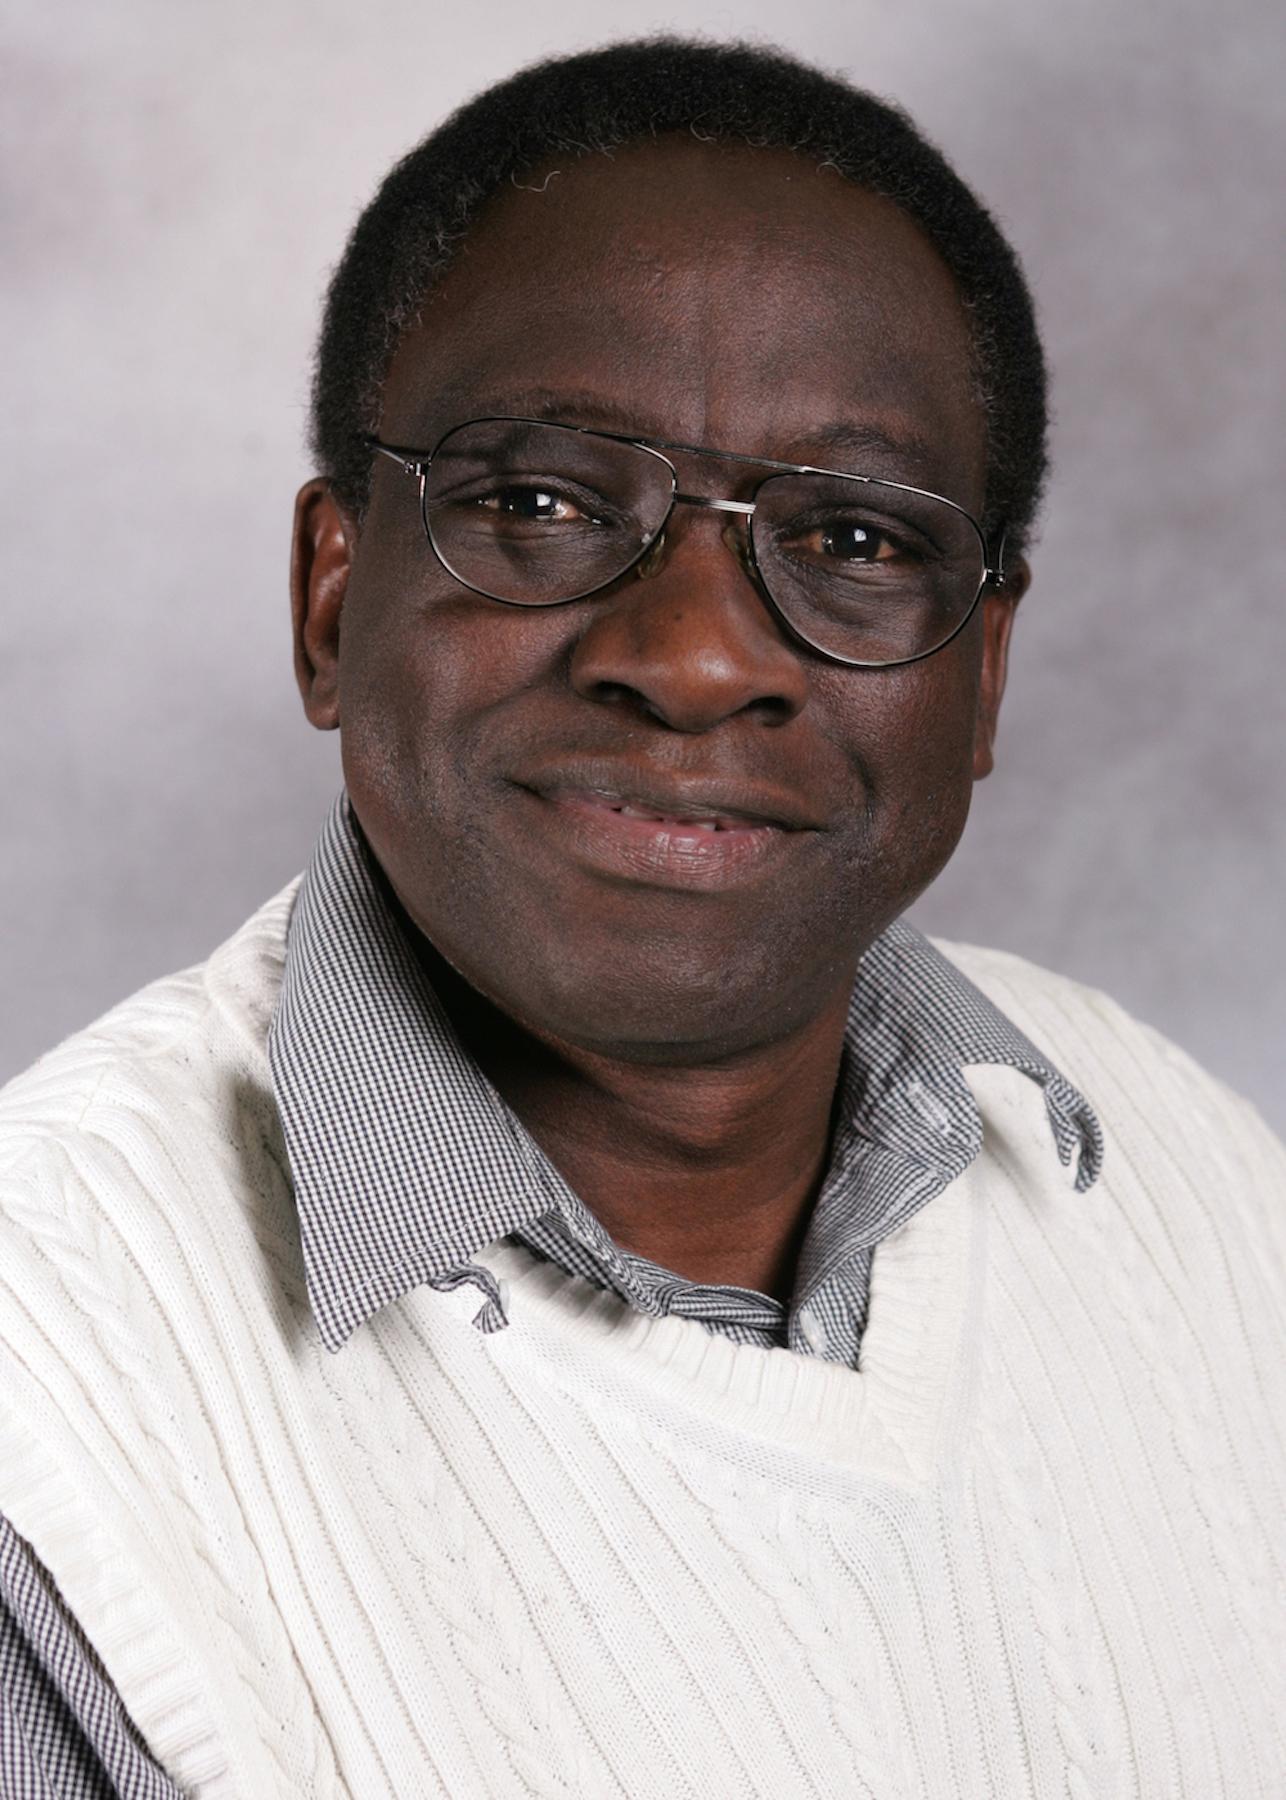 Prof John Nkemnji is Professor Emeritus, Educational Technology